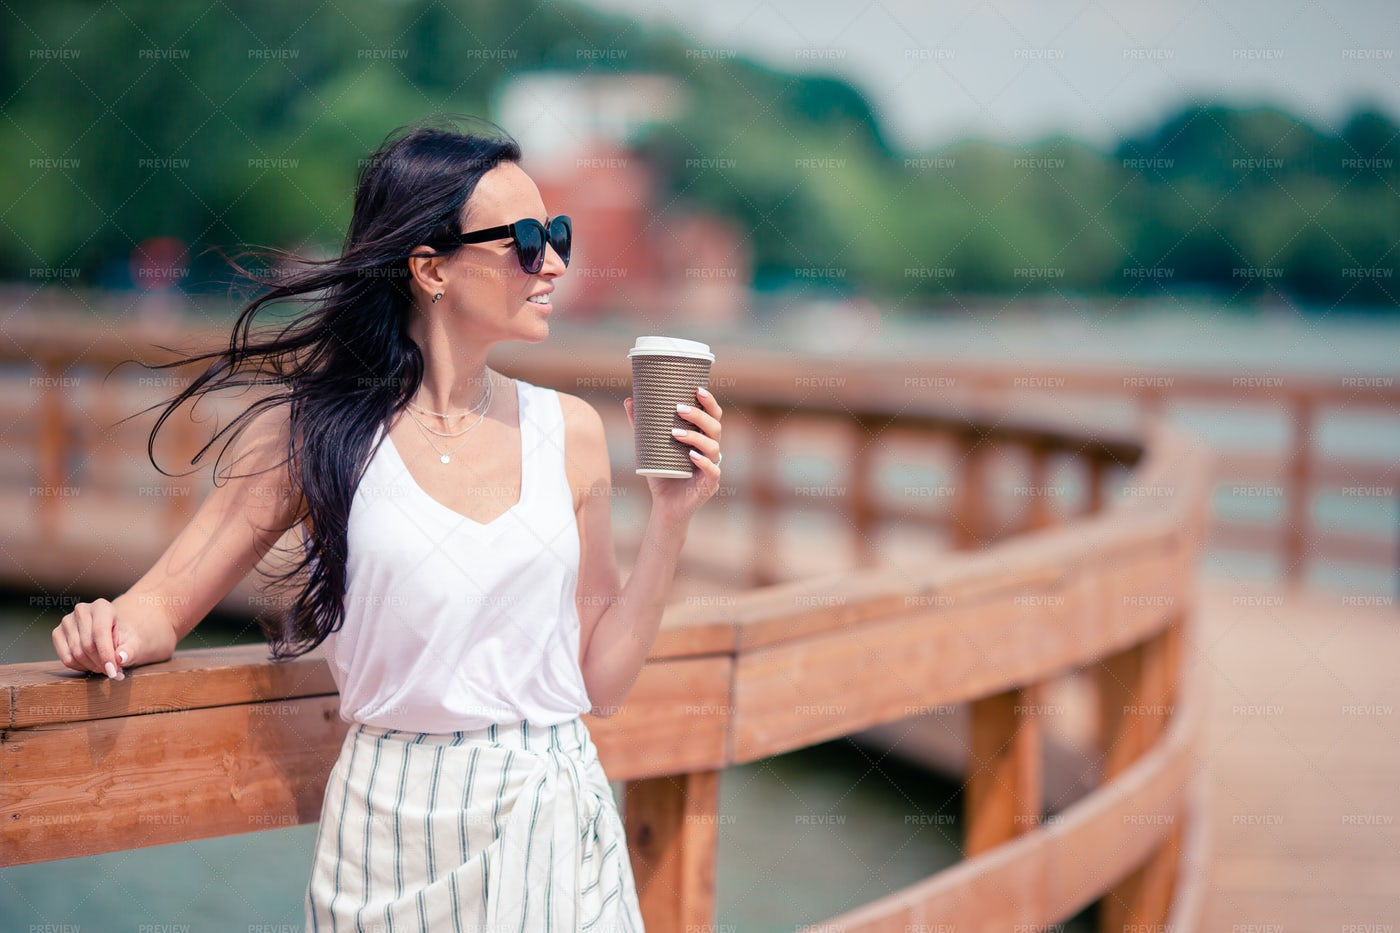 Drinking Coffee On A Bridge: Stock Photos